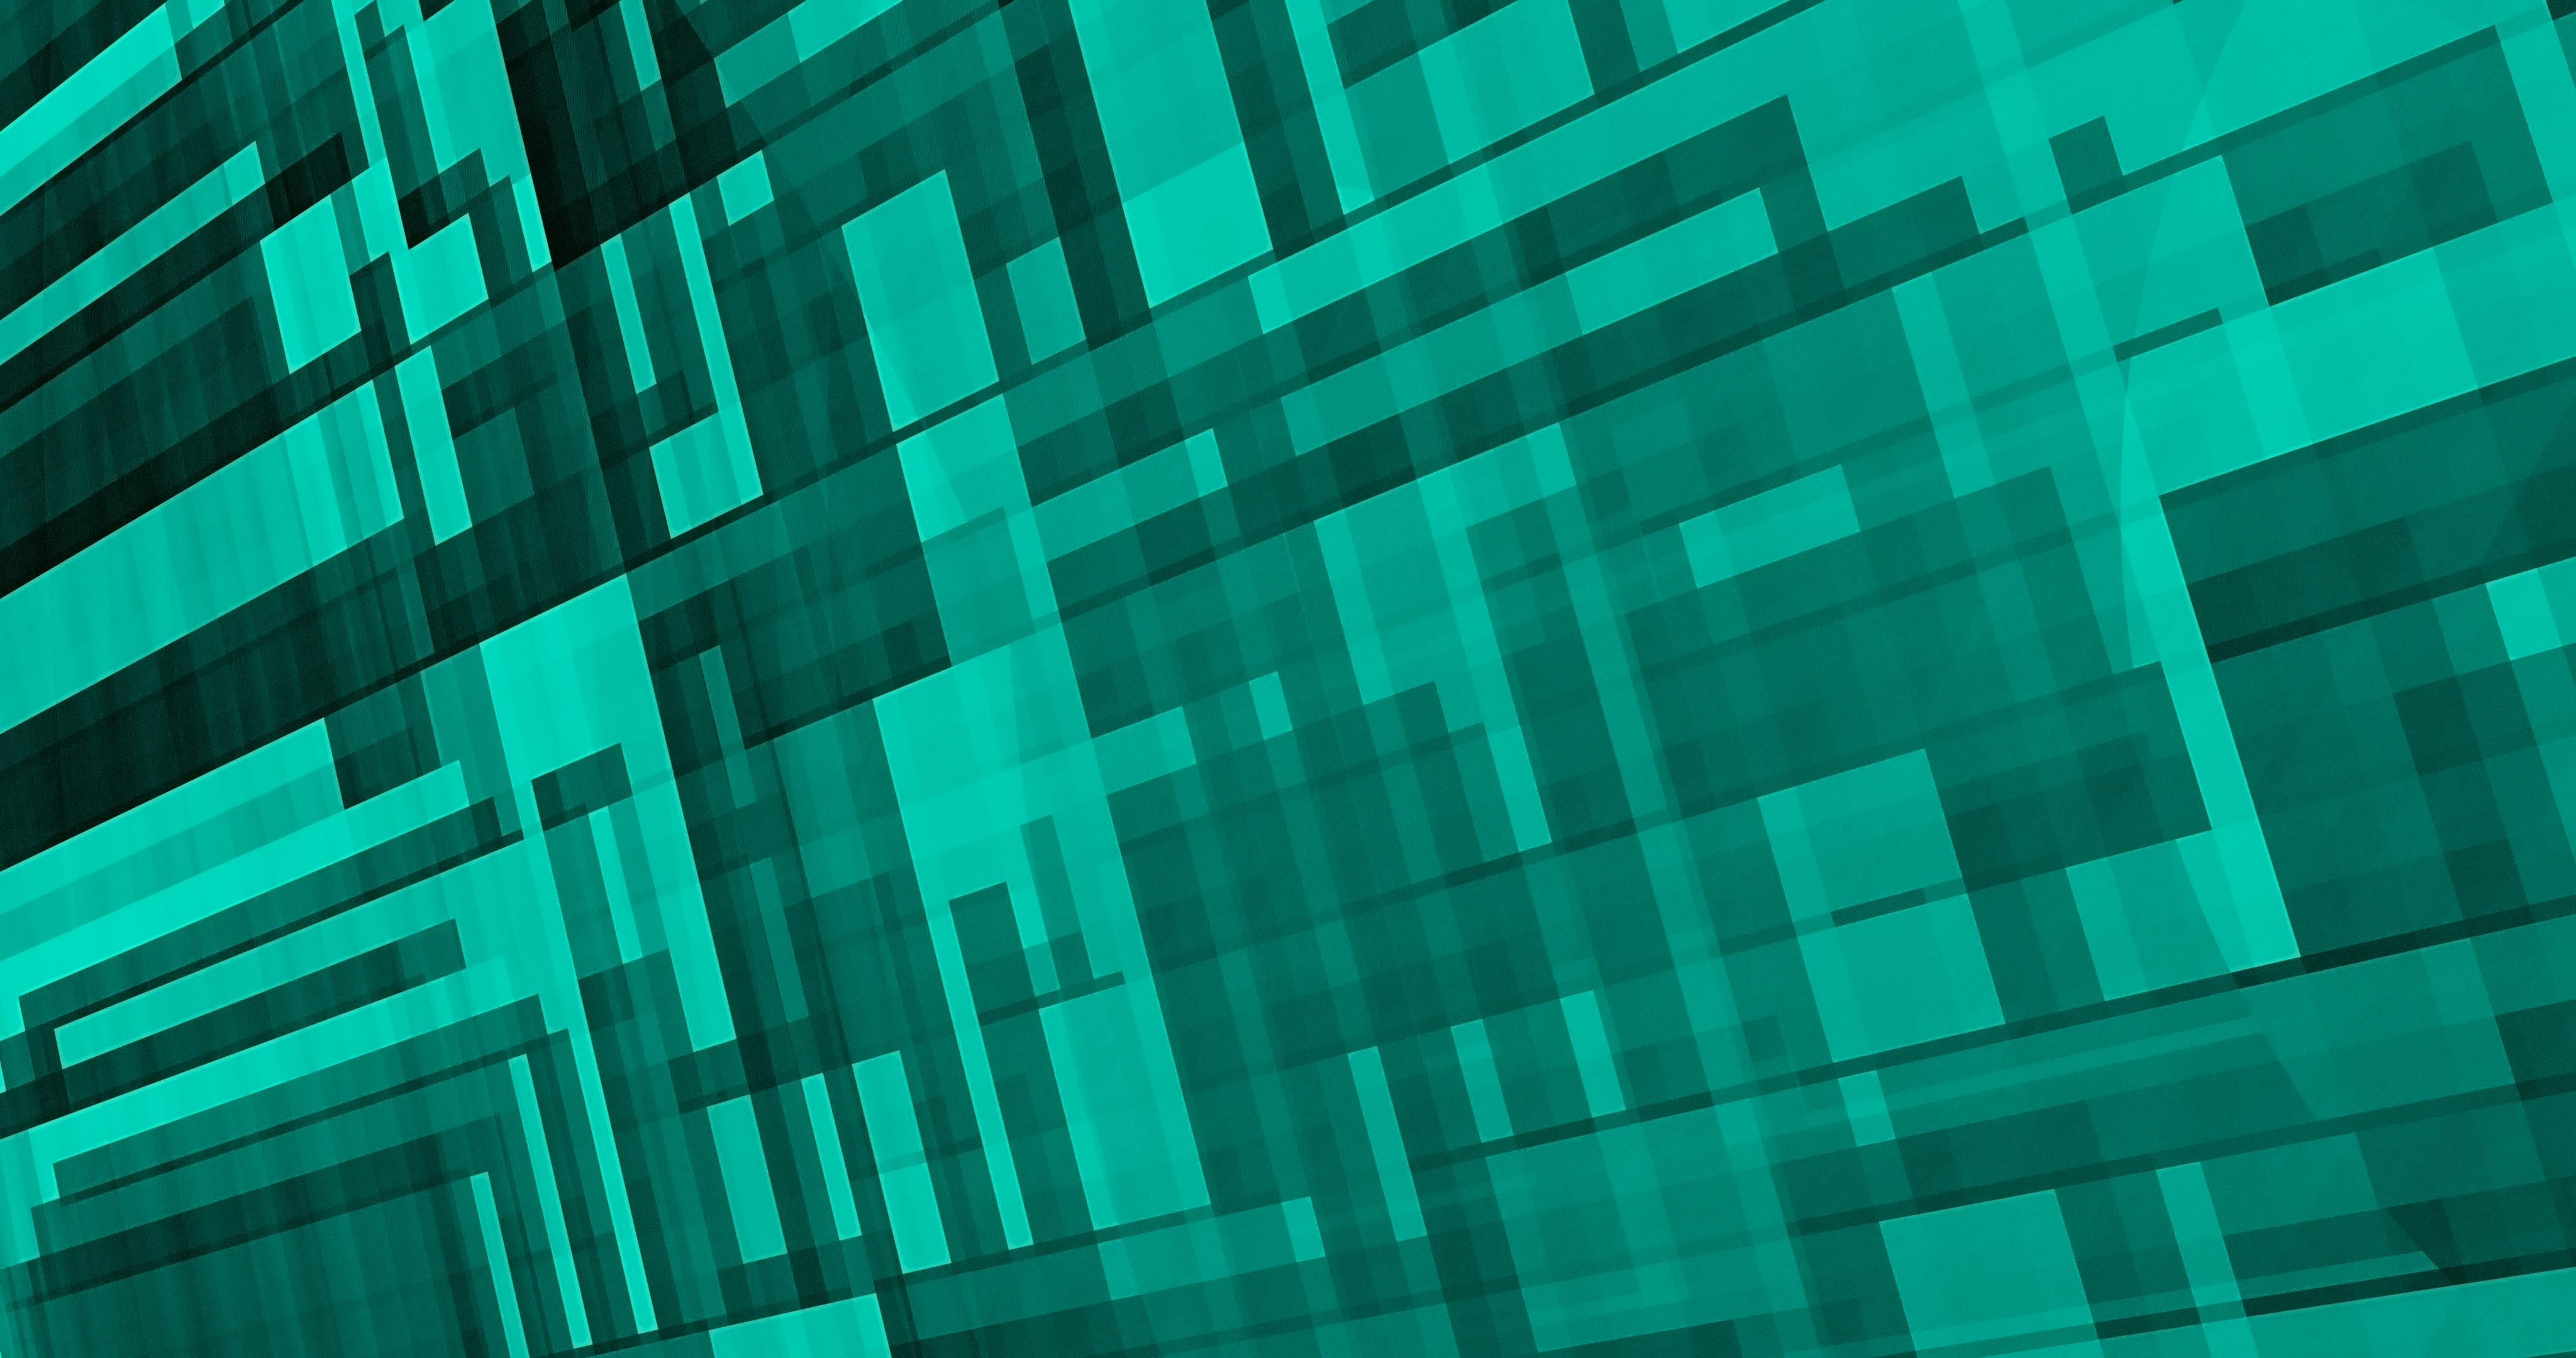 2560x1440 Neon Green Abstract 4k 1440p Resolution Hd 4k